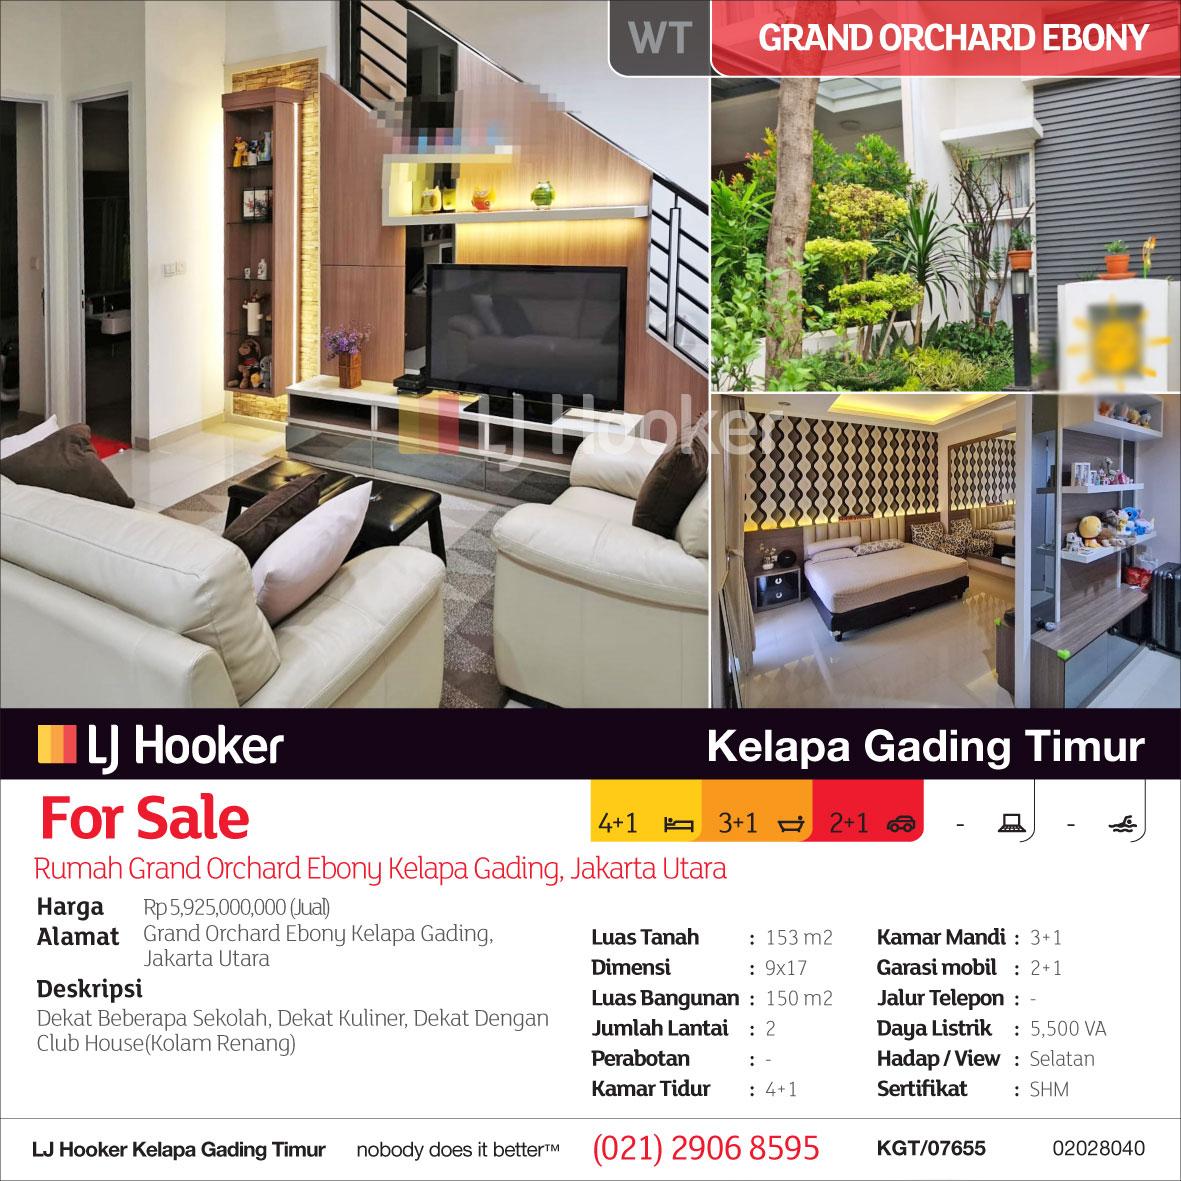 KGT/07655/WT (For Sale - Jual) Rumah Grand Orchard Ebony ...